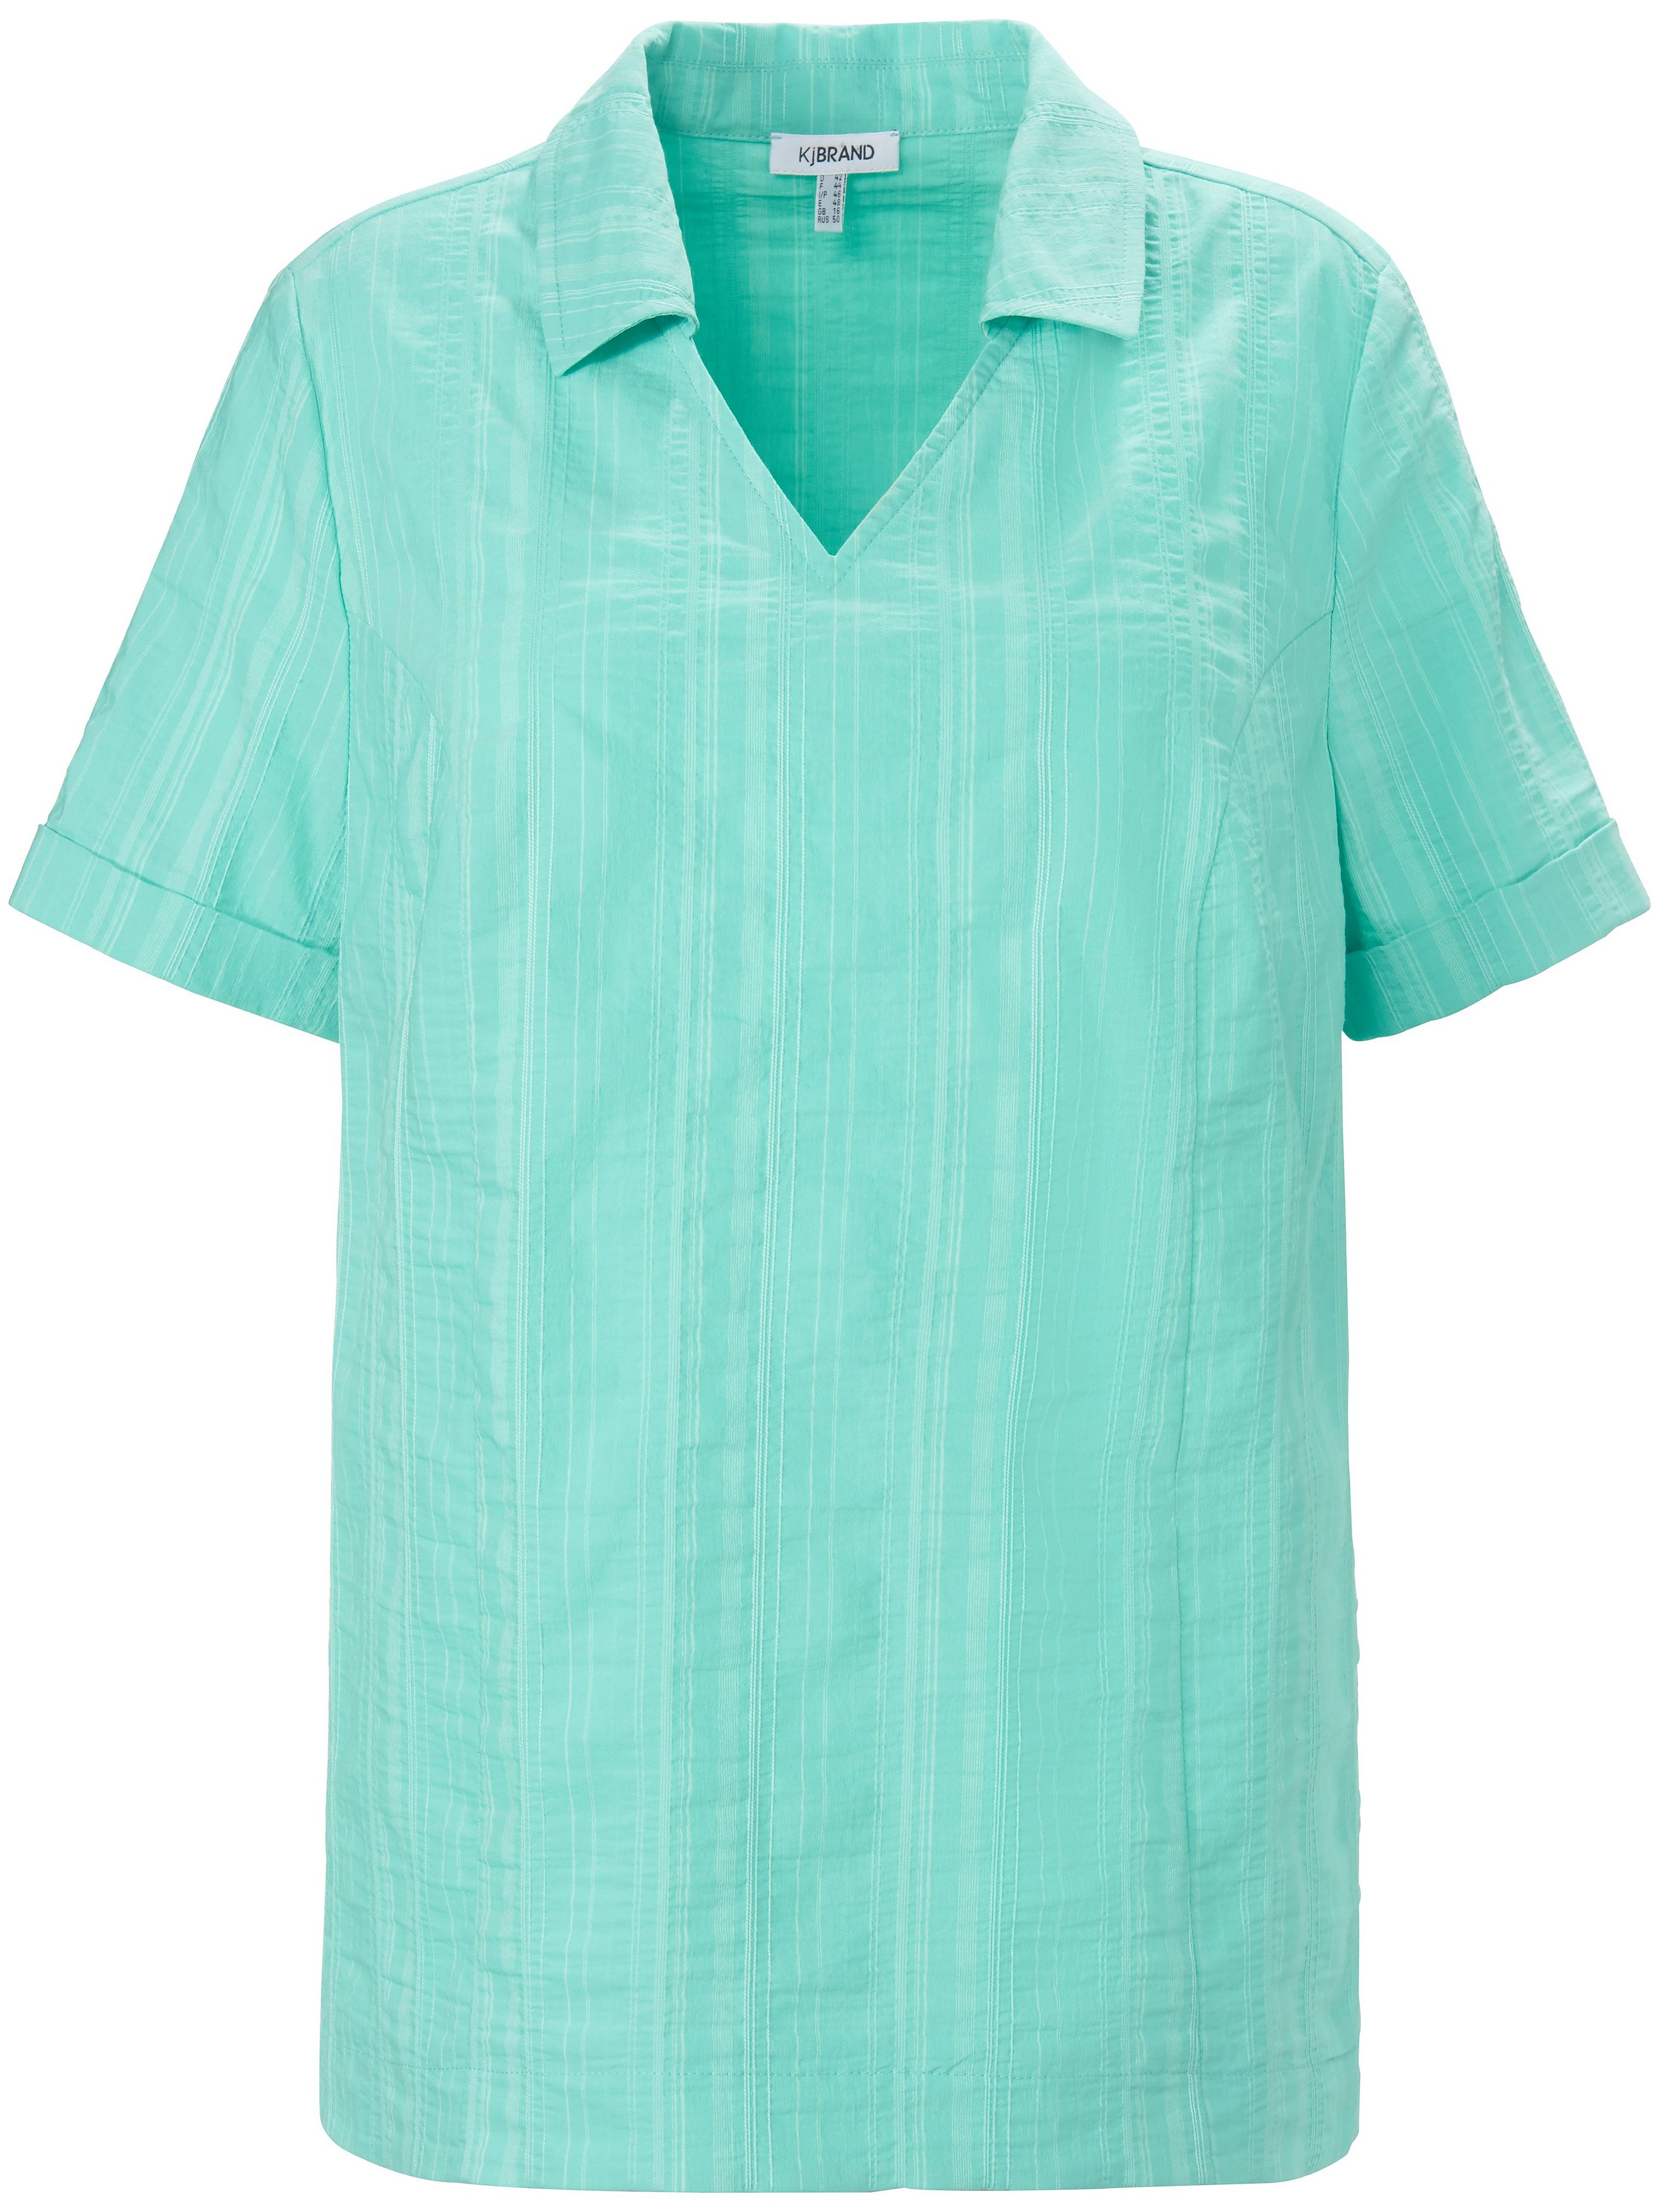 Pull-on style blouse Wash & Go KjBrand turquoise